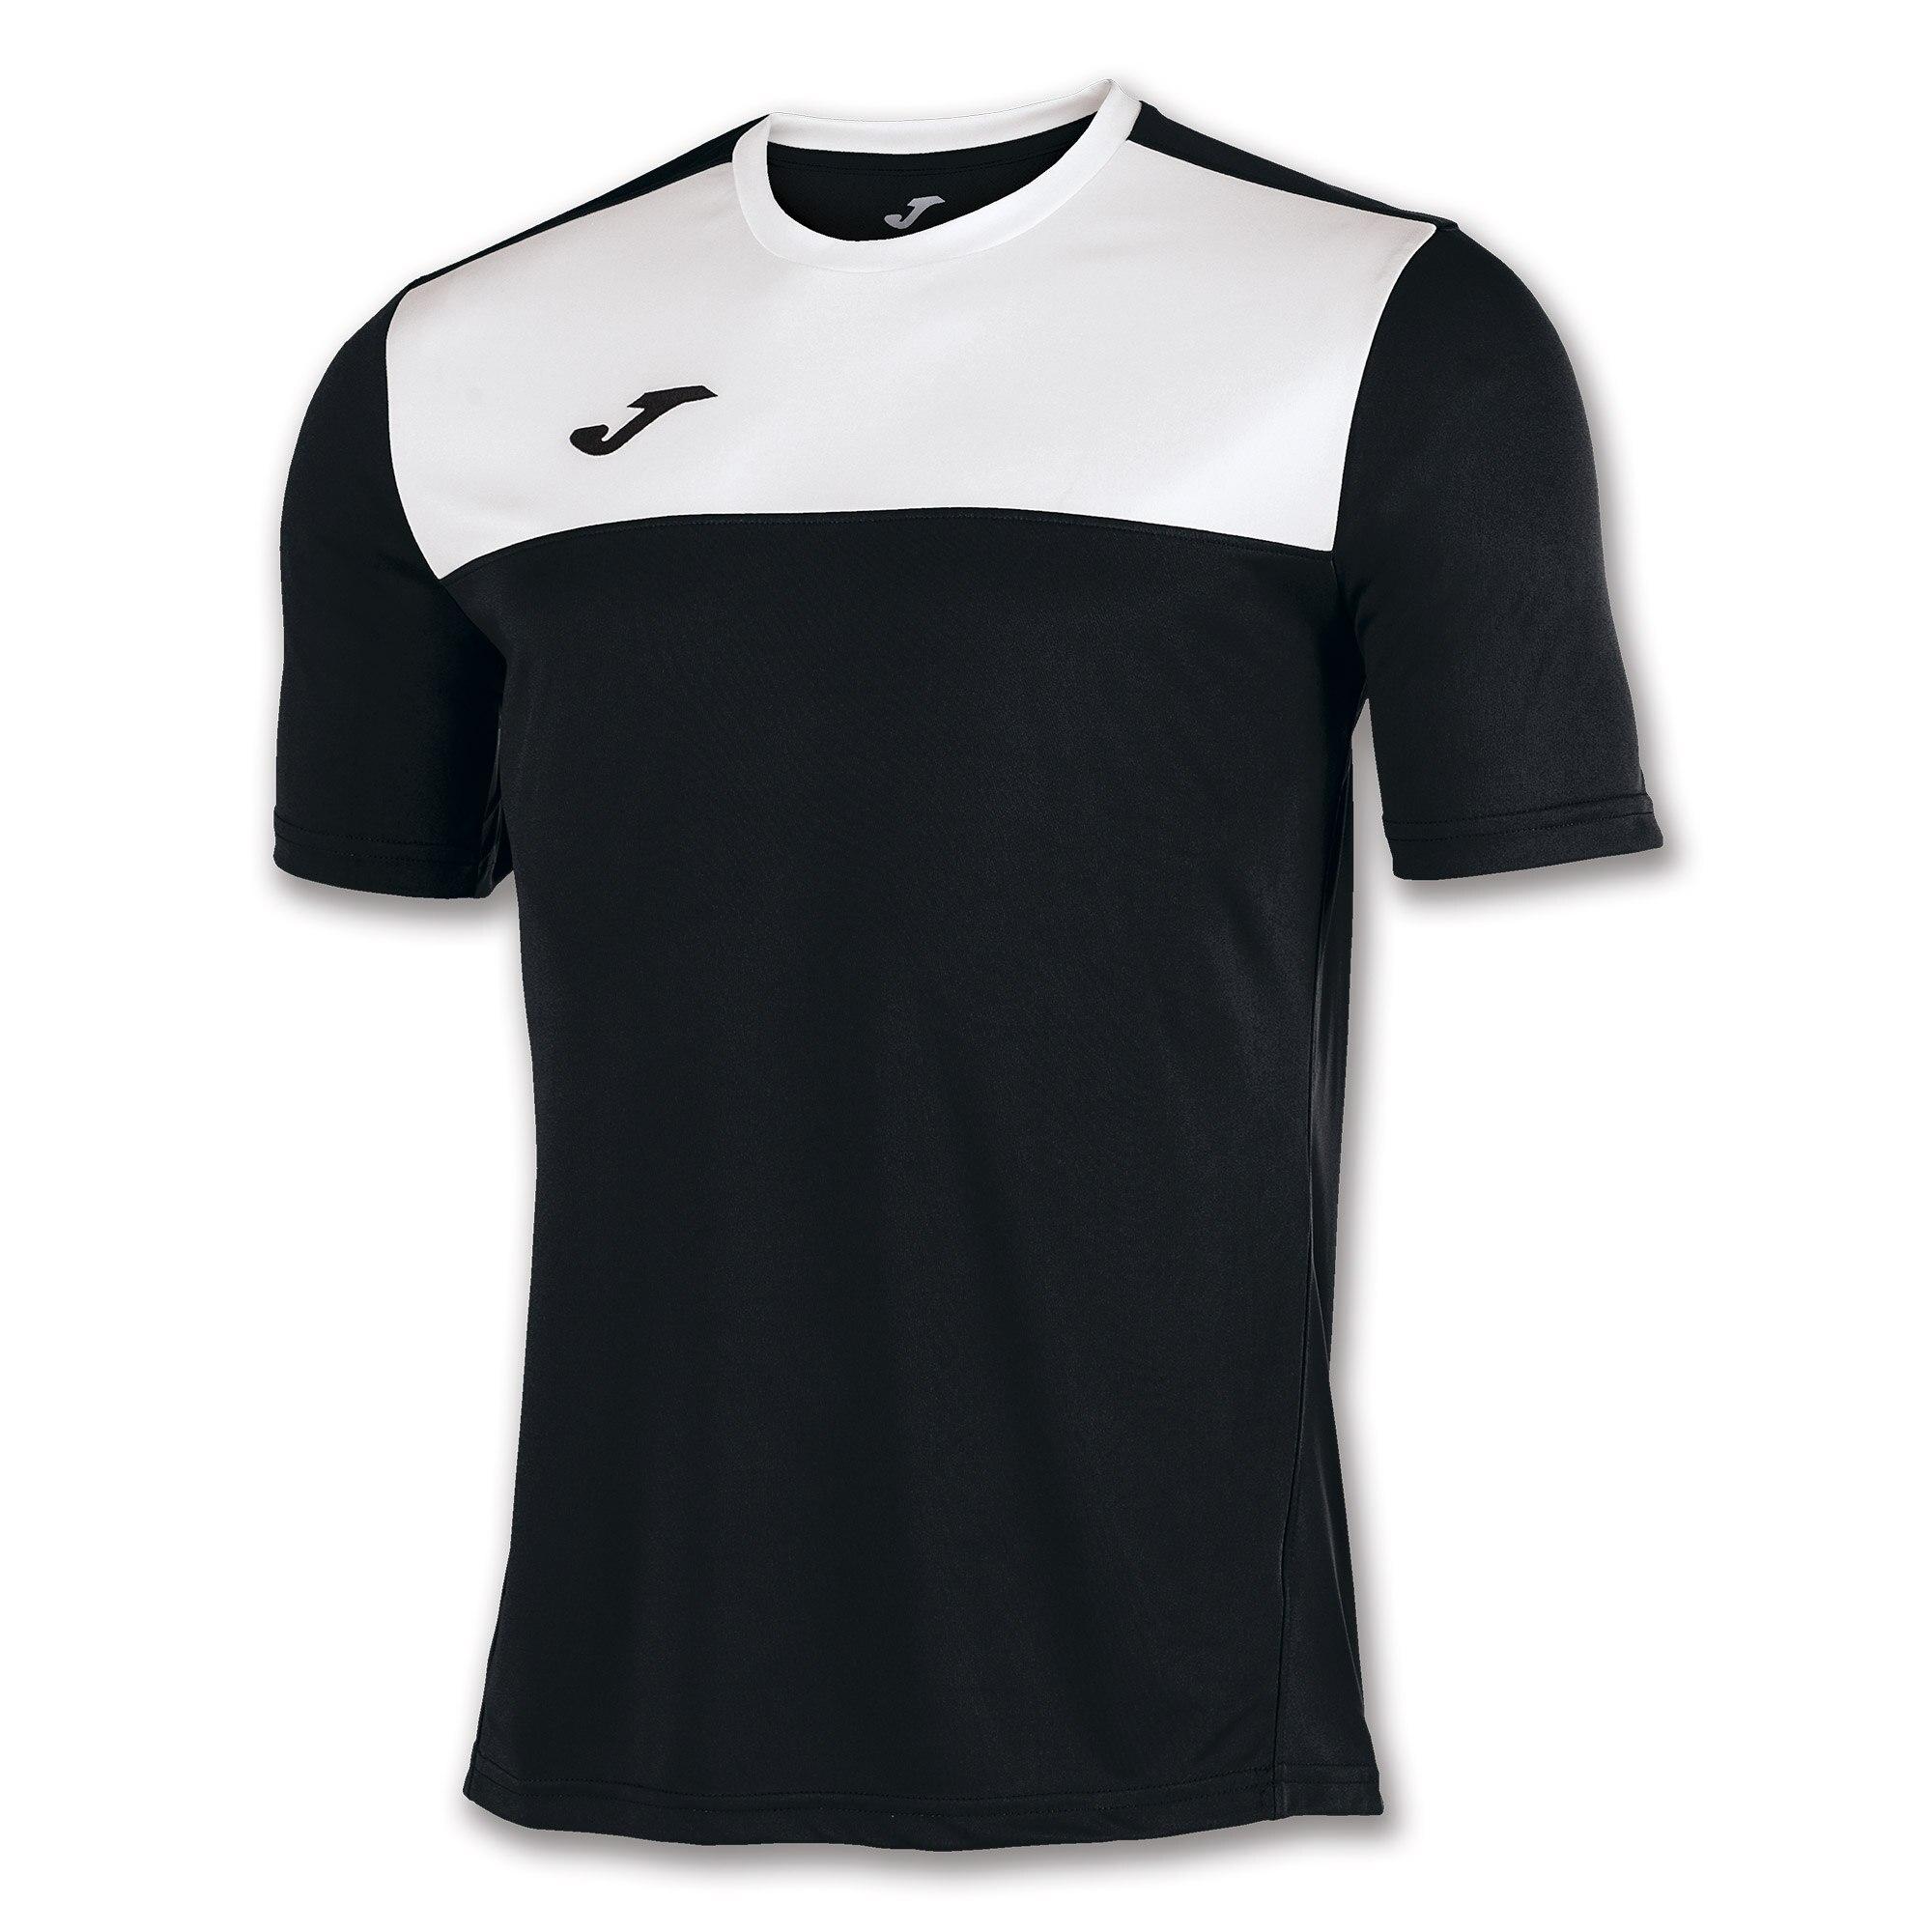 Camiseta Winner JOMA para hombre